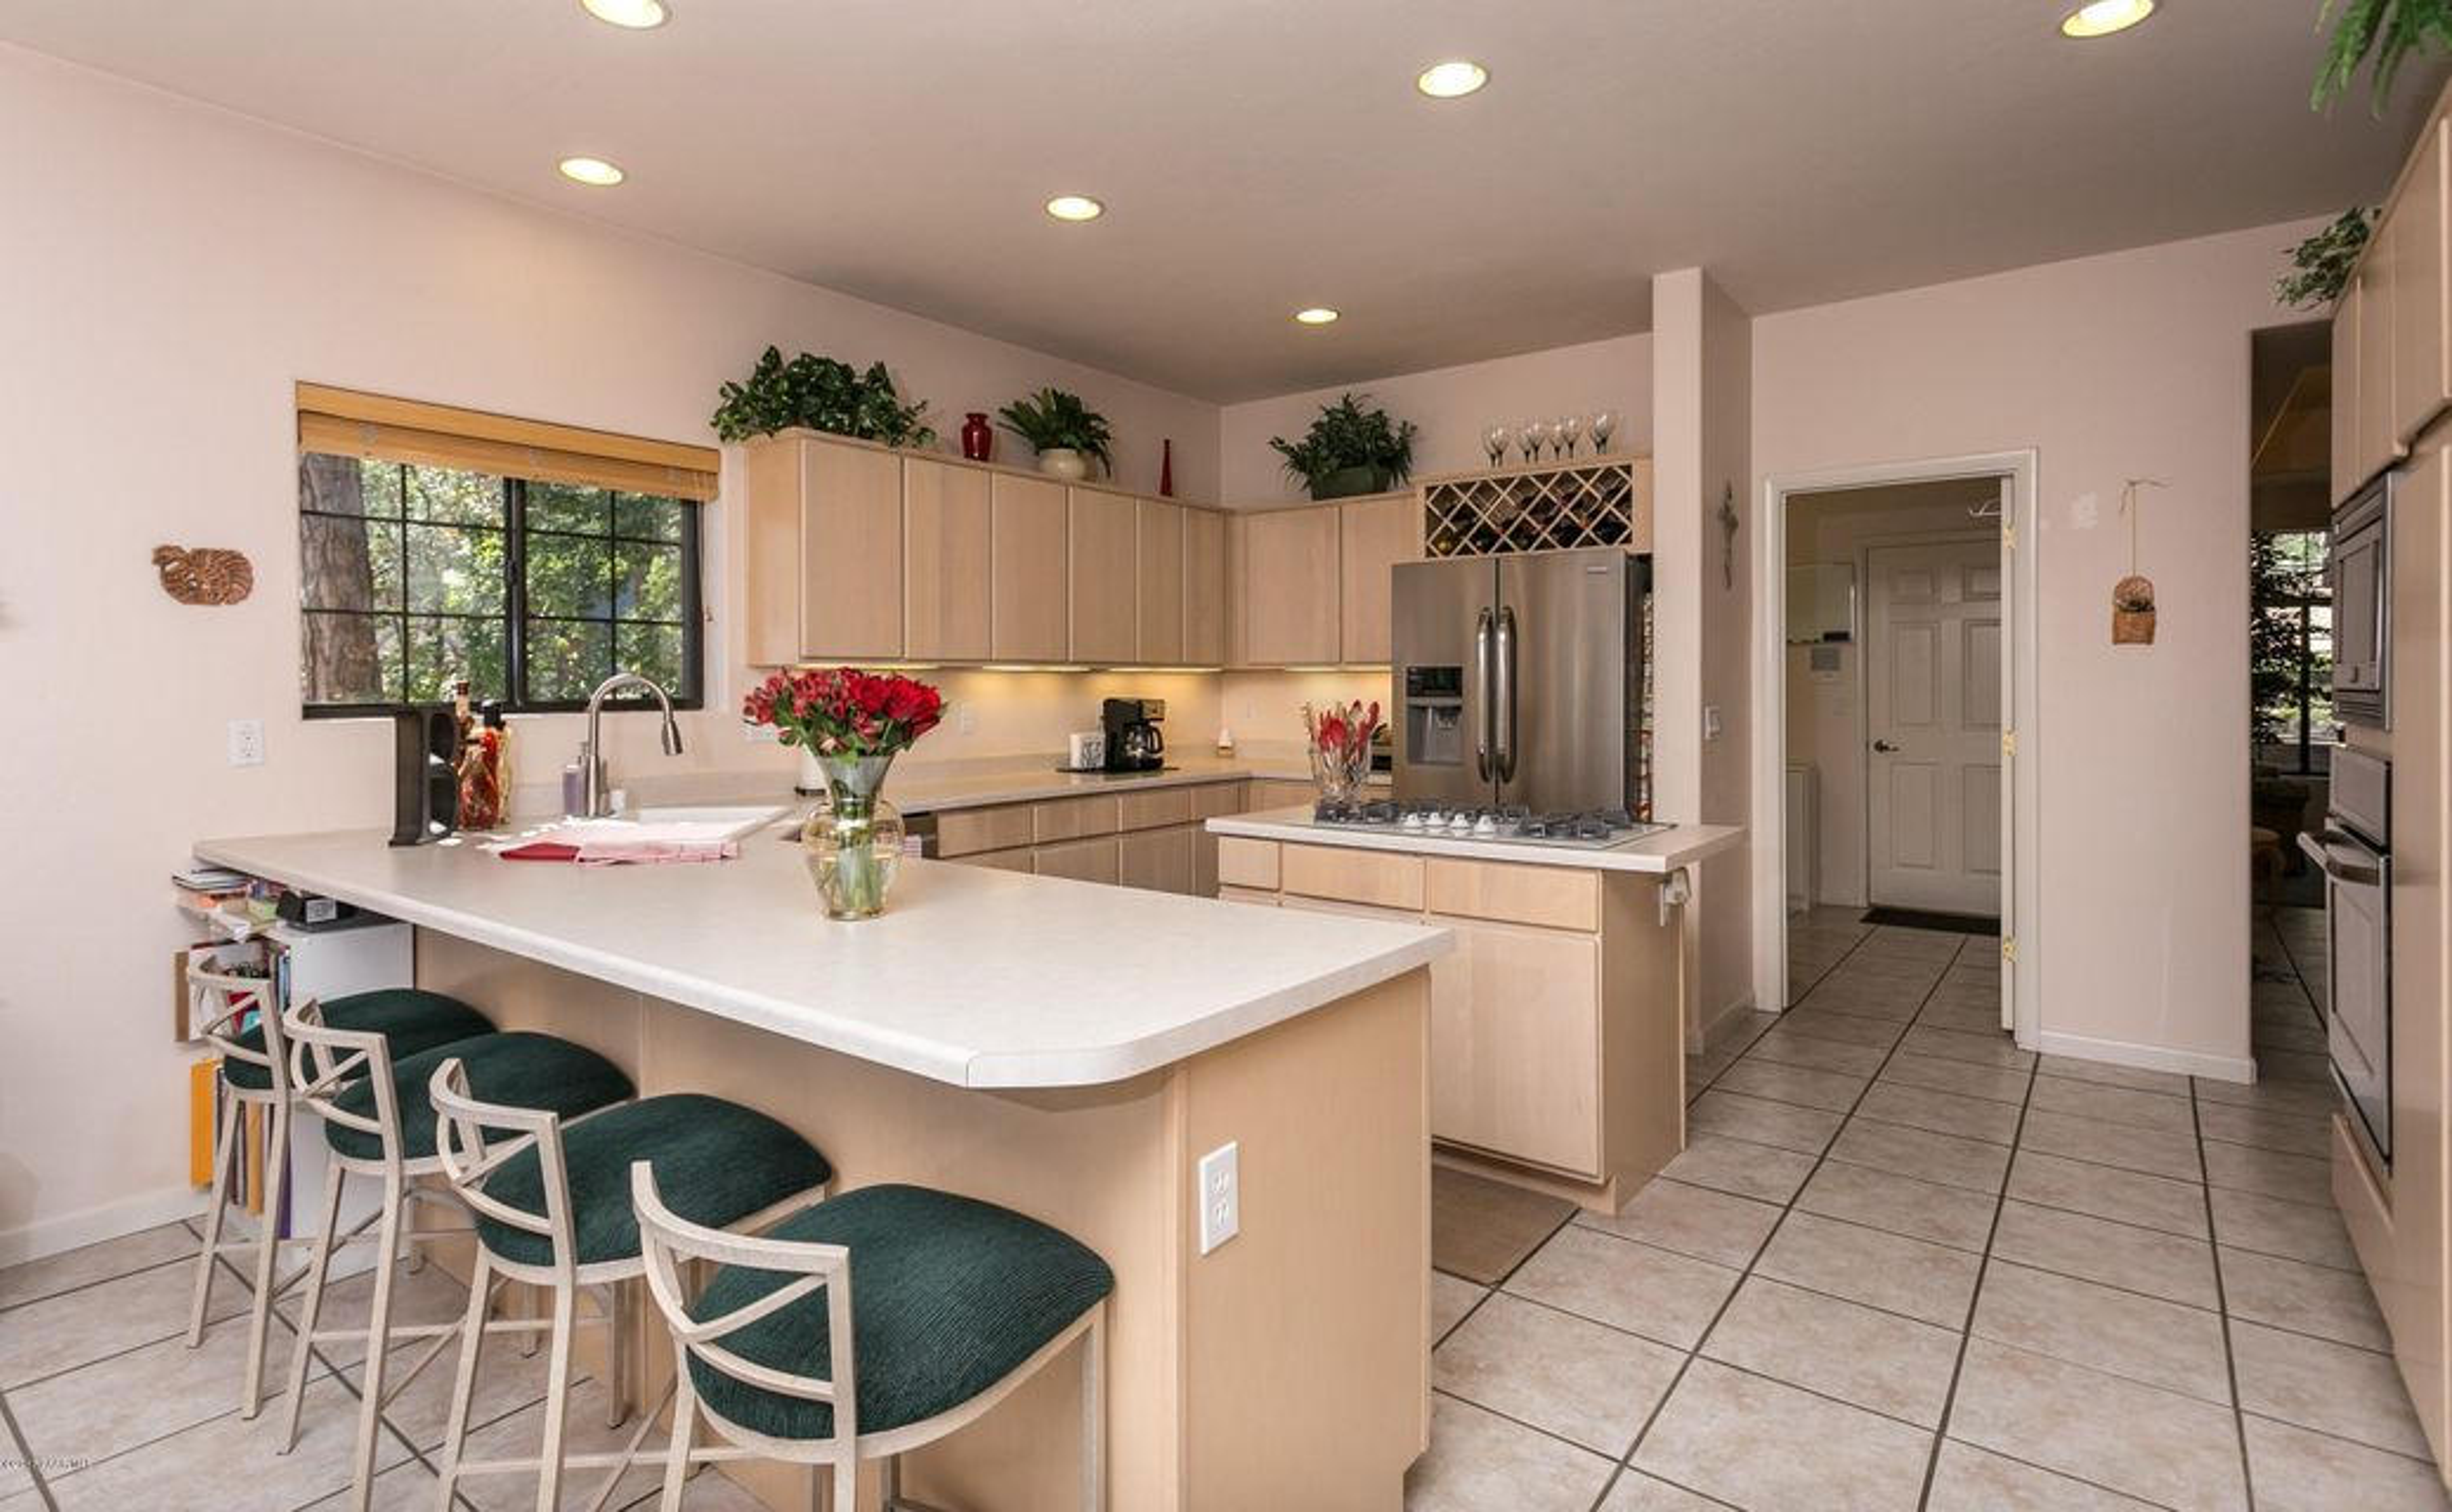 1162 Timber Ridge,Prescott,Arizona,86303,4 Bedrooms Bedrooms,3 BathroomsBathrooms,Site built single family,Timber Ridge,1004549